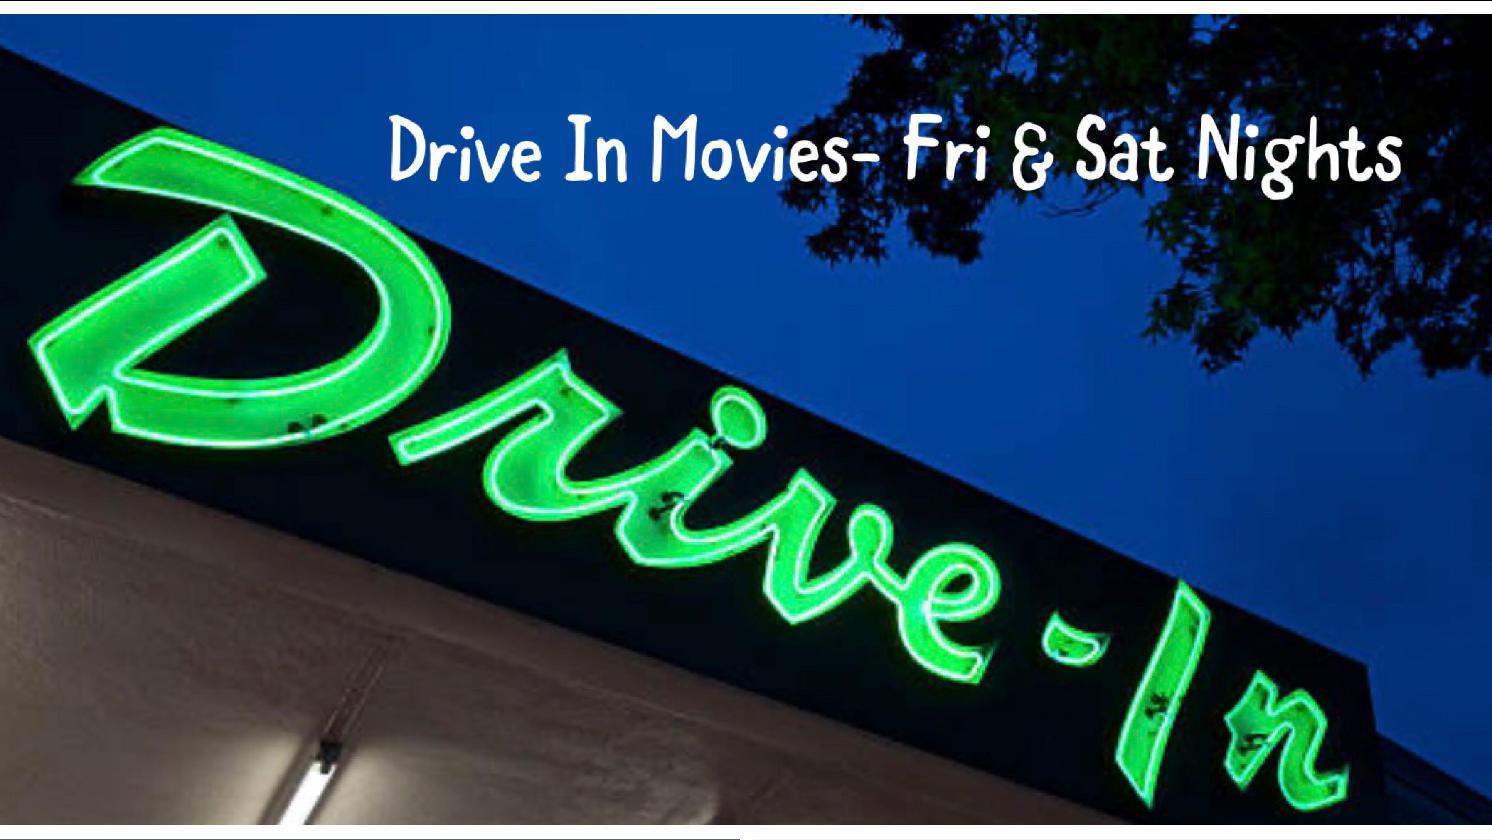 Drive-In Movies--Fri & Sat Nights at Aurora Cineplex (Roswell)-thru Aug 15th